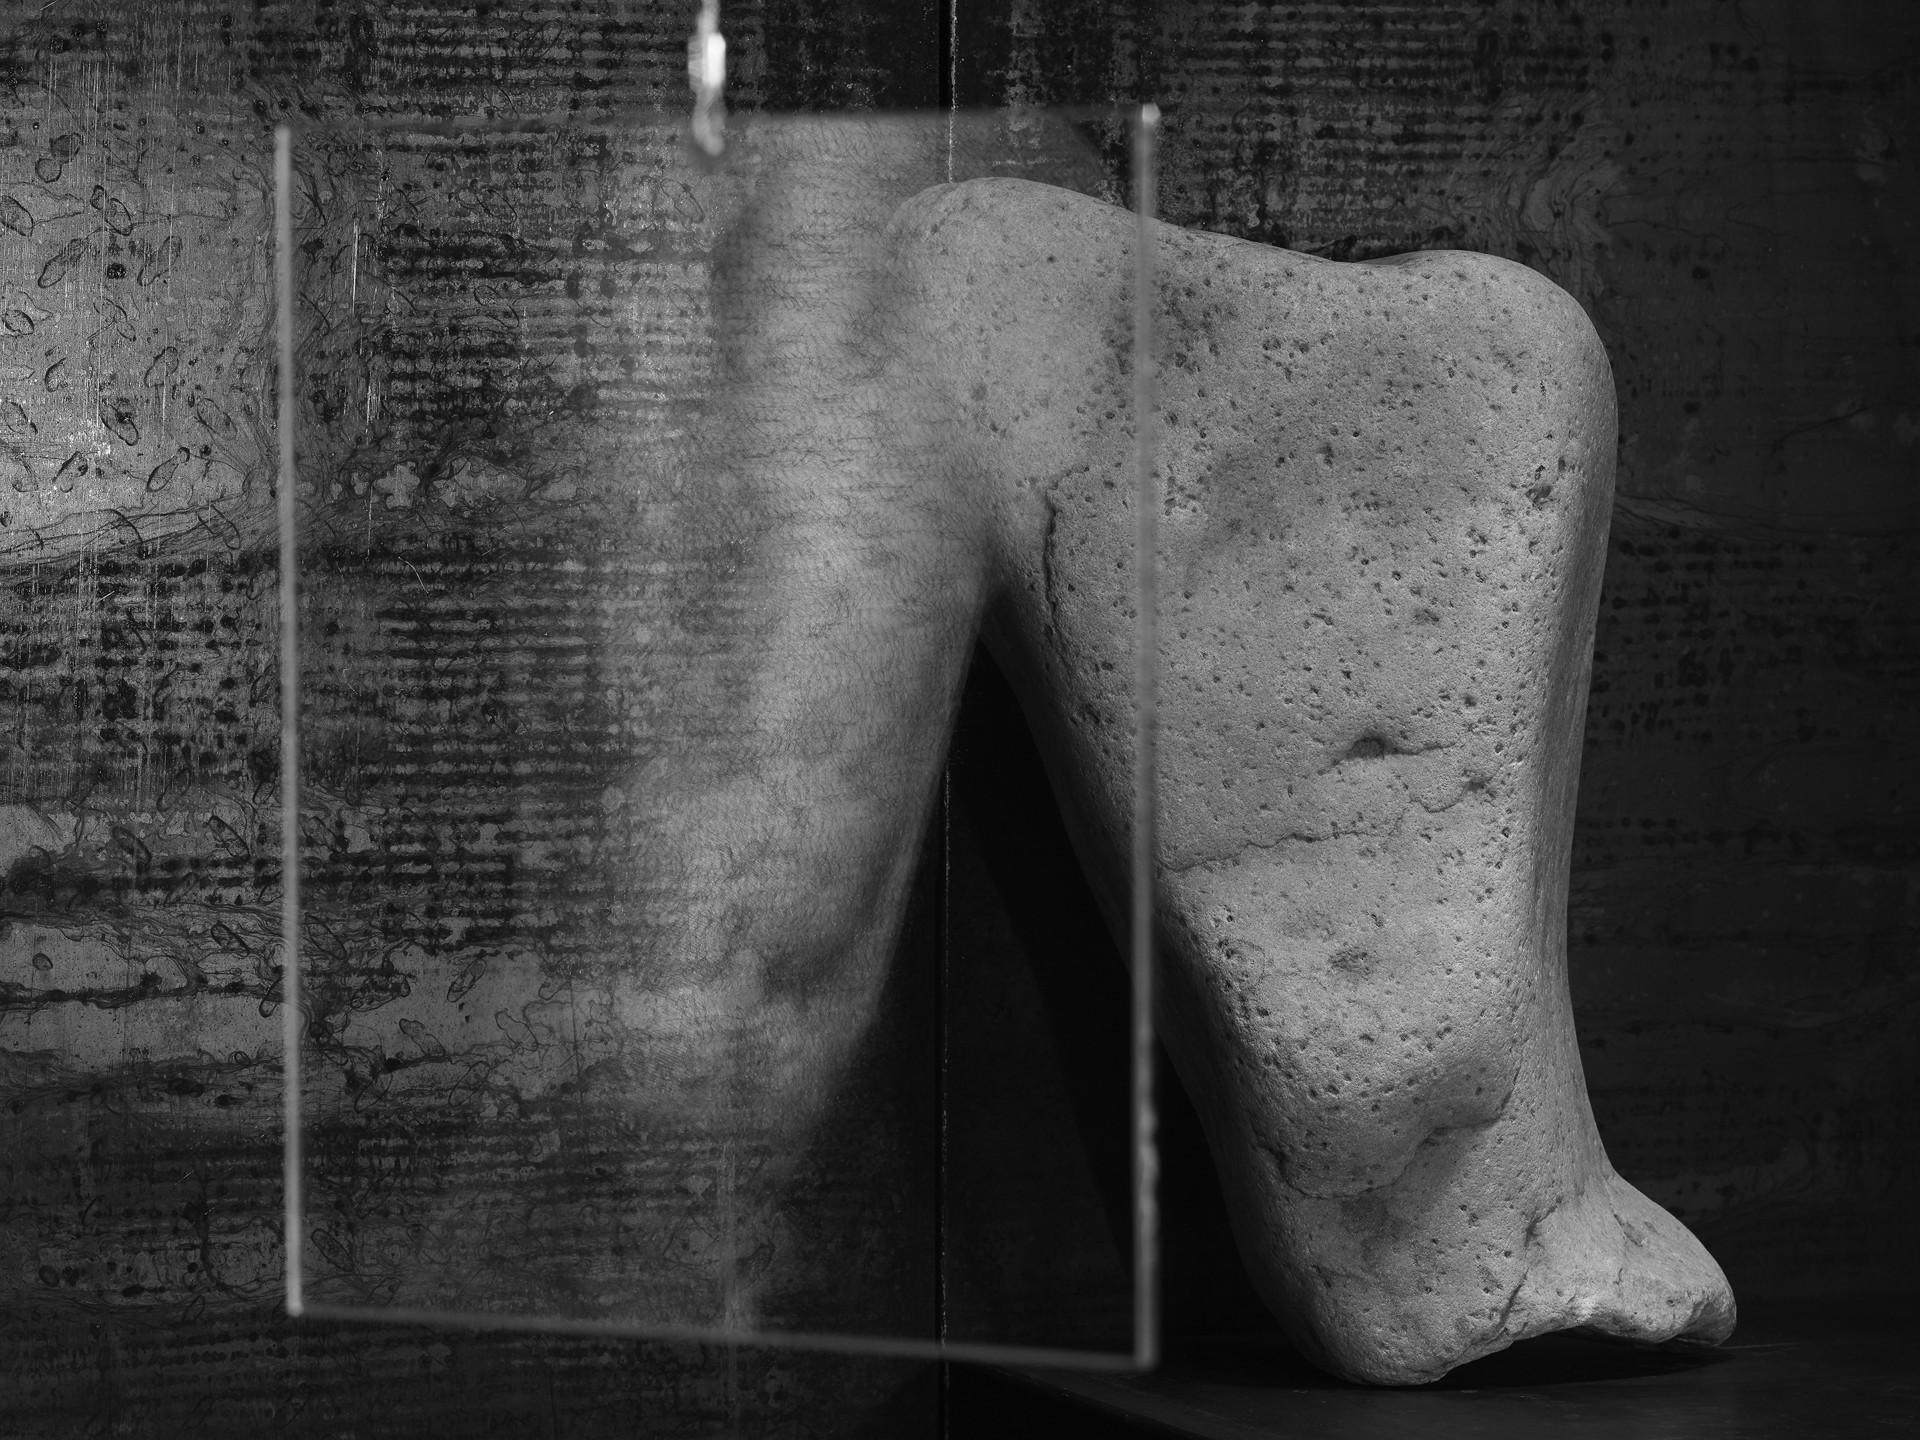 Rock Knee by Frank Sherwood White